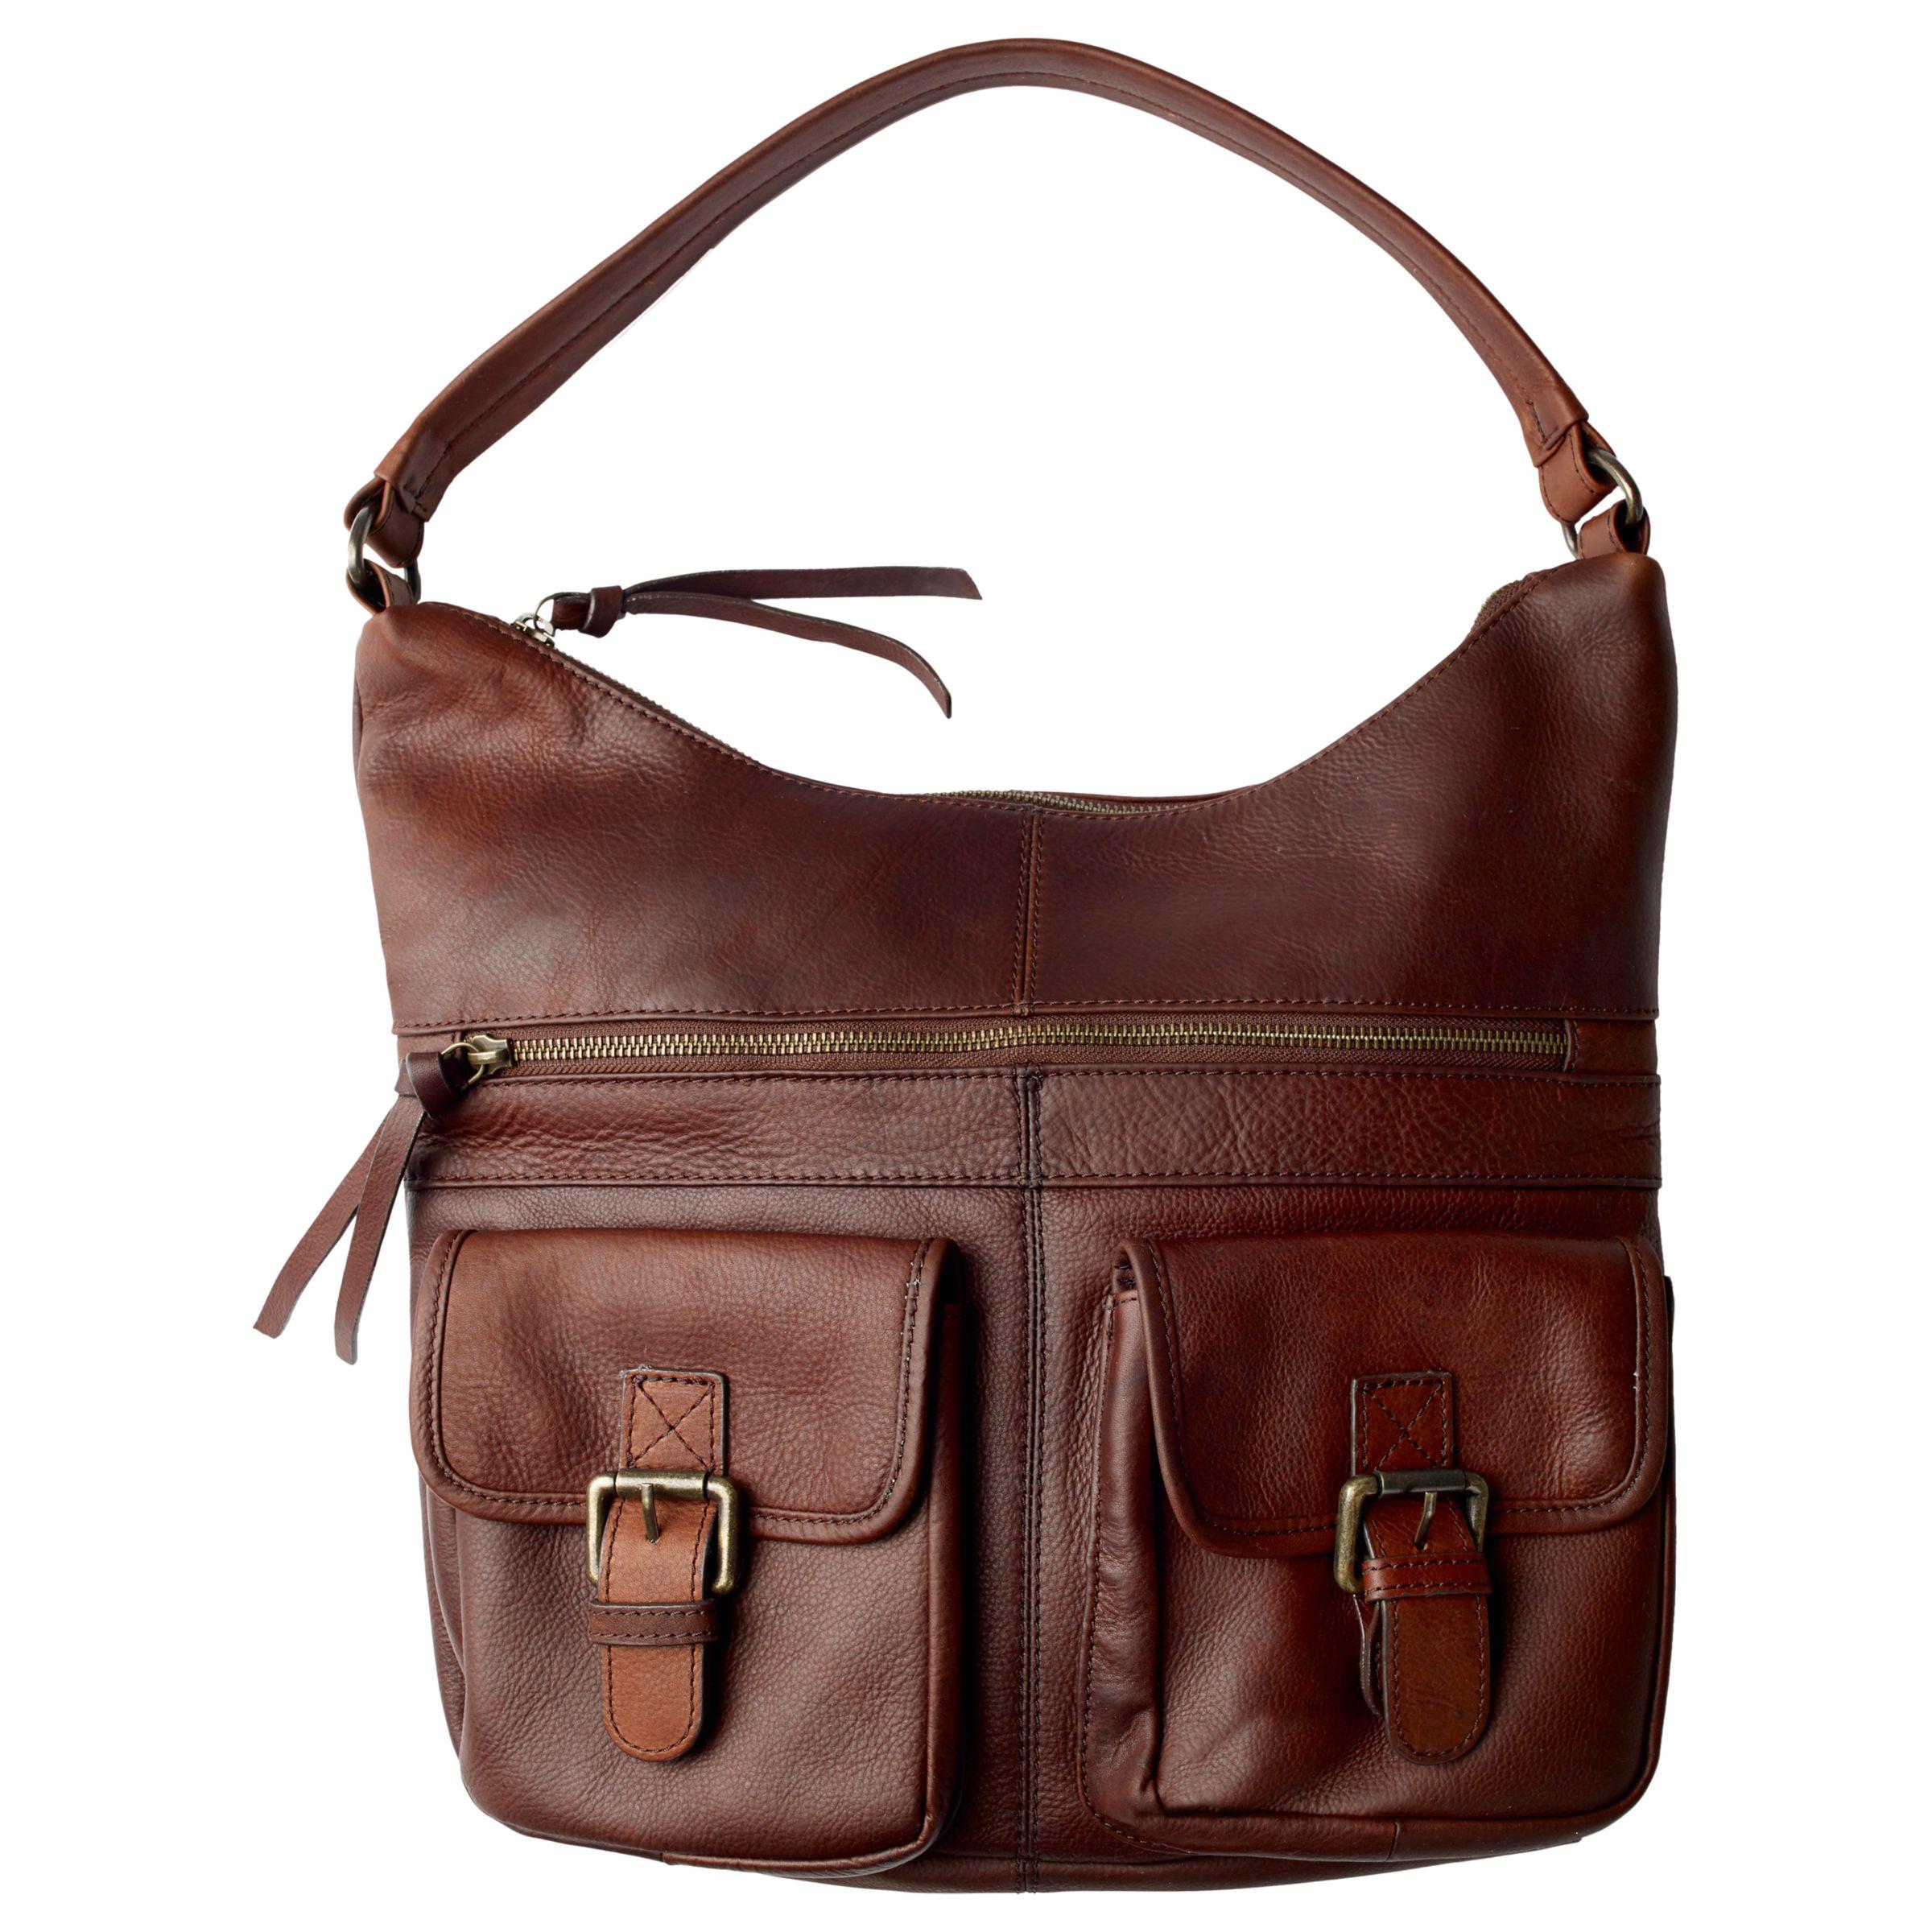 6bded93d55c Fat Face Amelia Leather Shoulder Bag, Chocolate at John Lewis & Partners